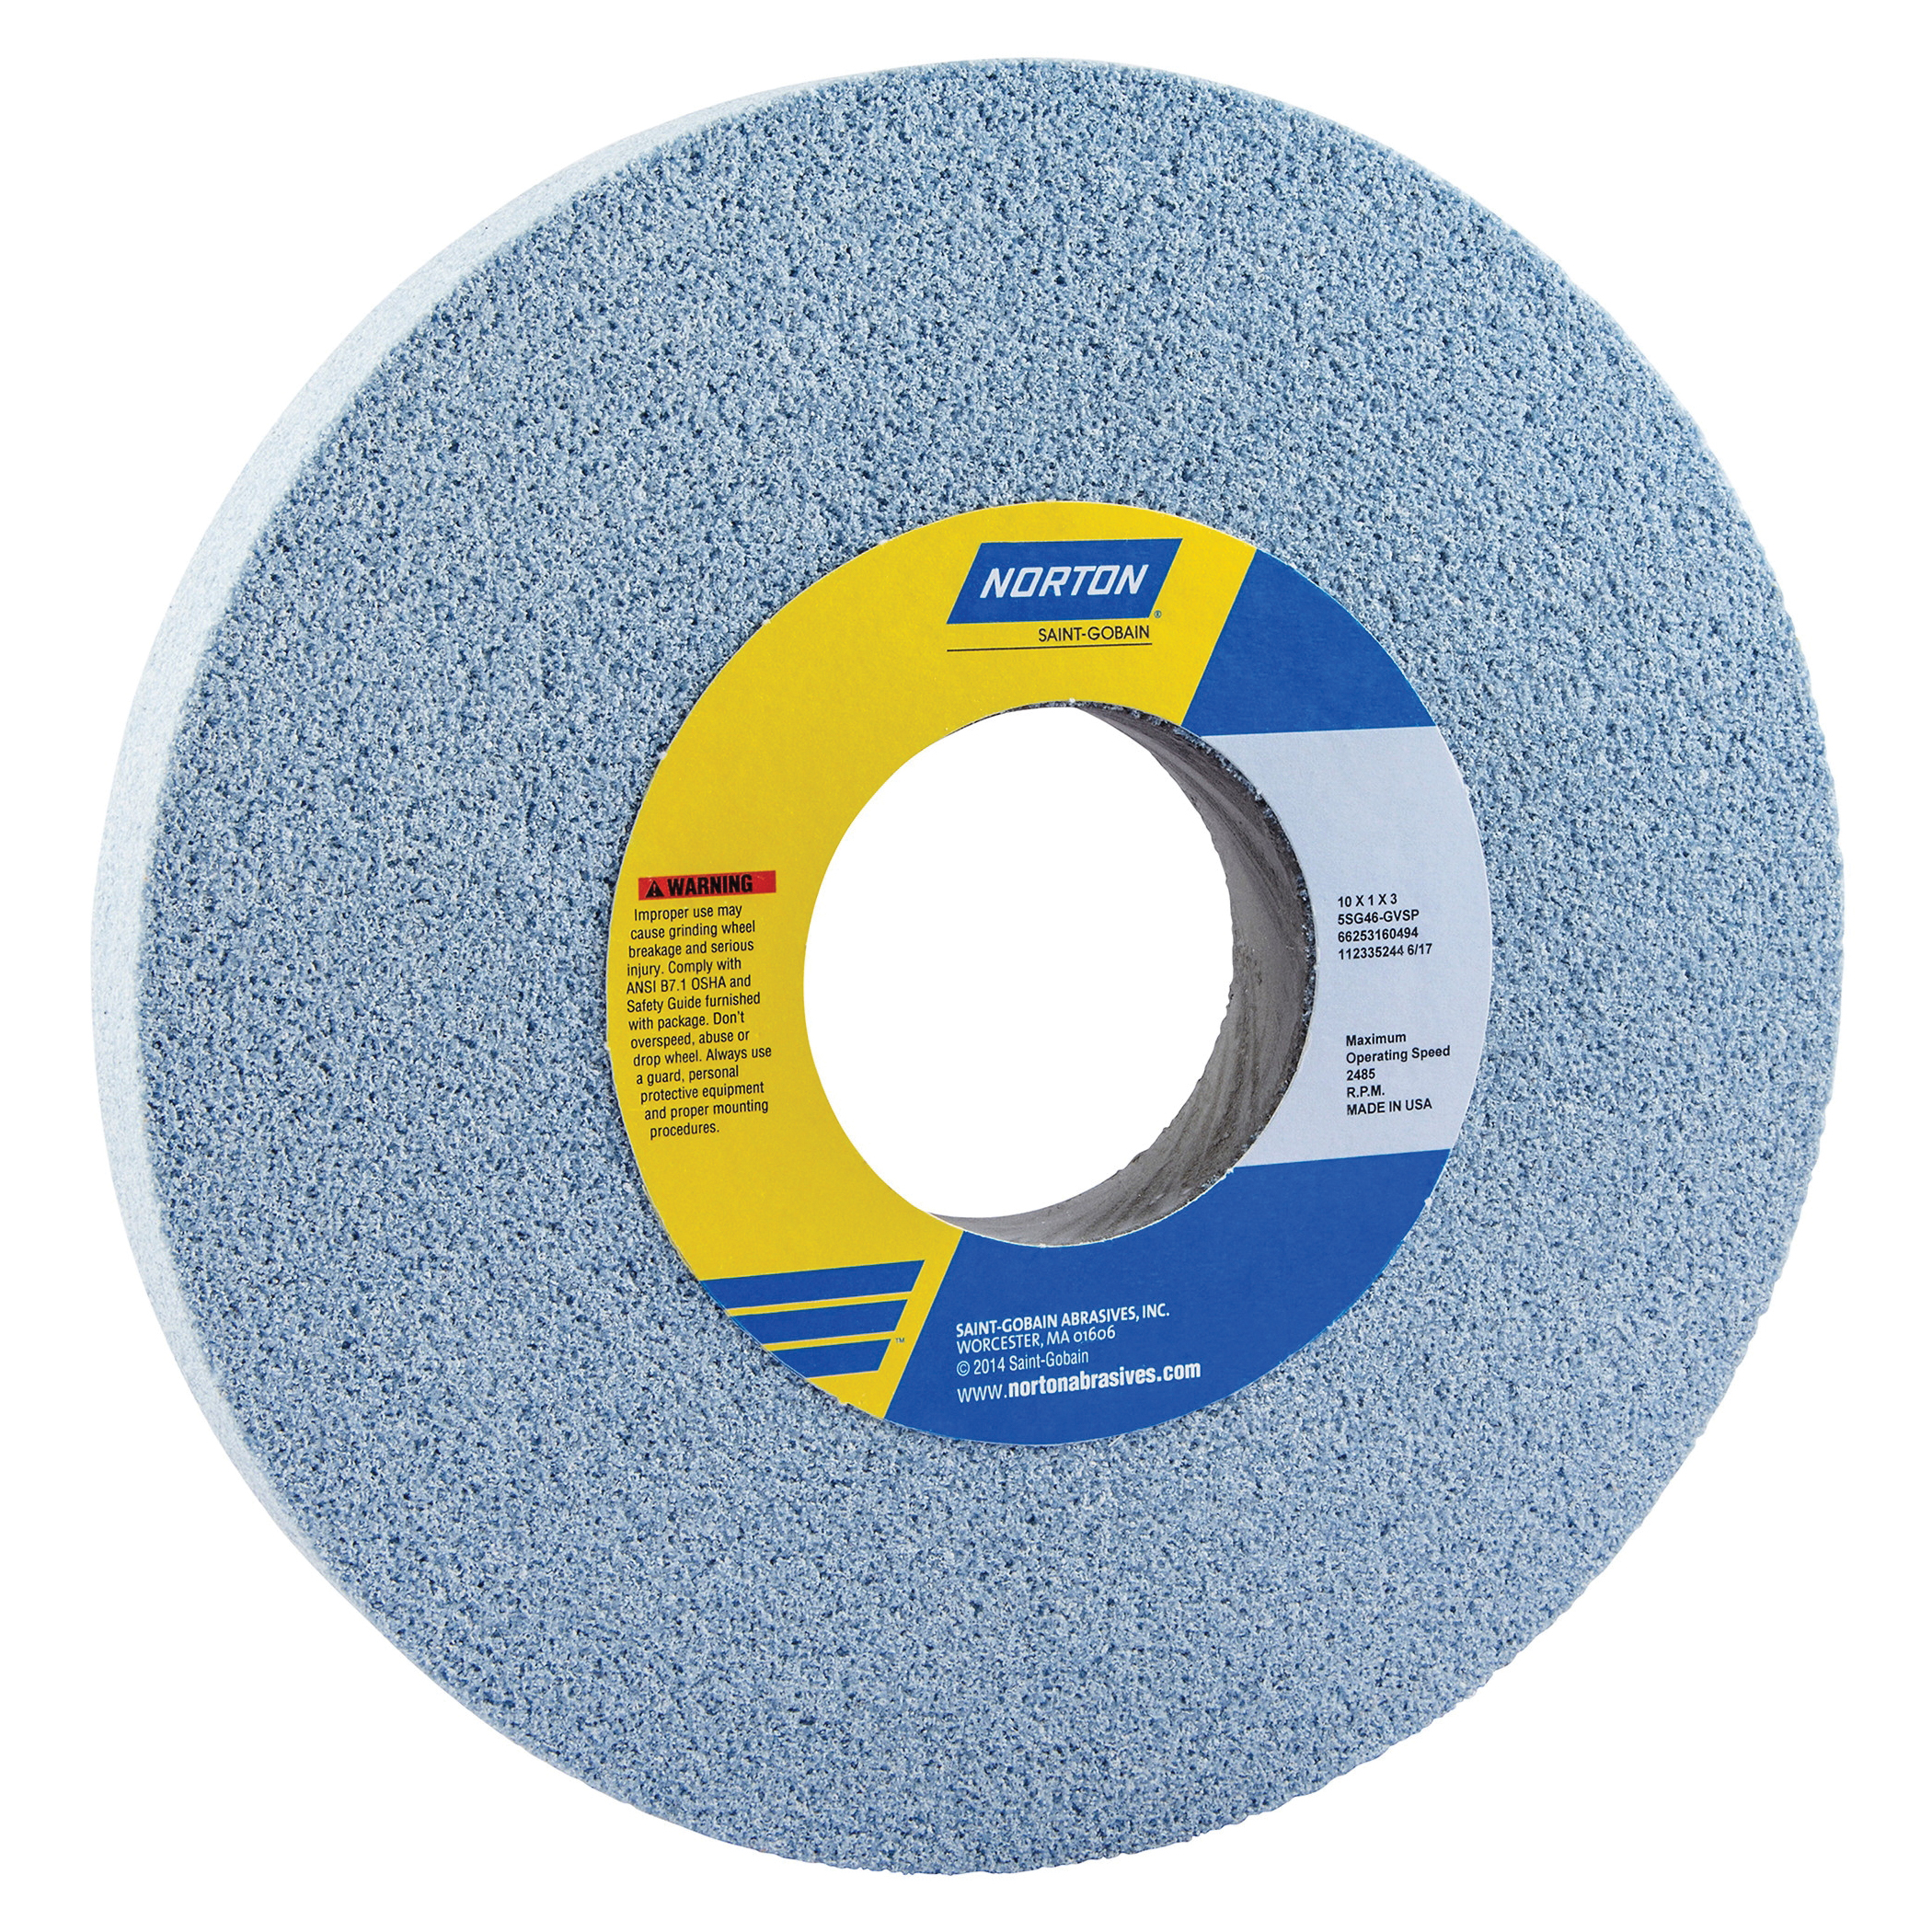 Norton® 66253160495 5SG Straight Toolroom Wheel, 10 in Dia x 1 in THK, 3 in Center Hole, 60 Grit, Ceramic Alumina/Friable Aluminum Oxide Abrasive